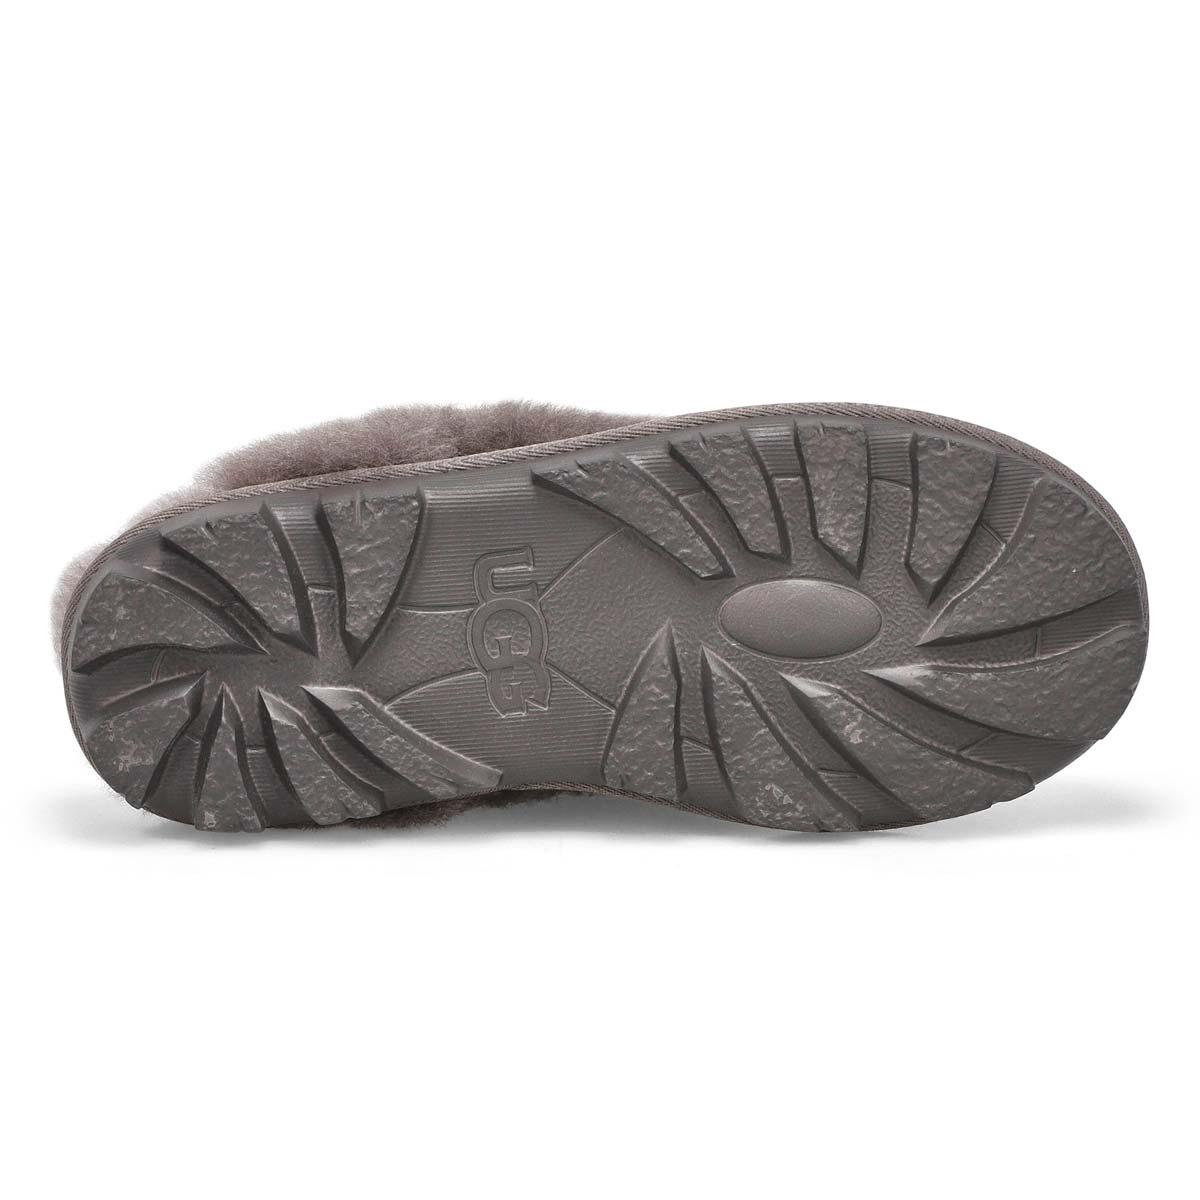 Lds Coquette grey sheepskin slipper